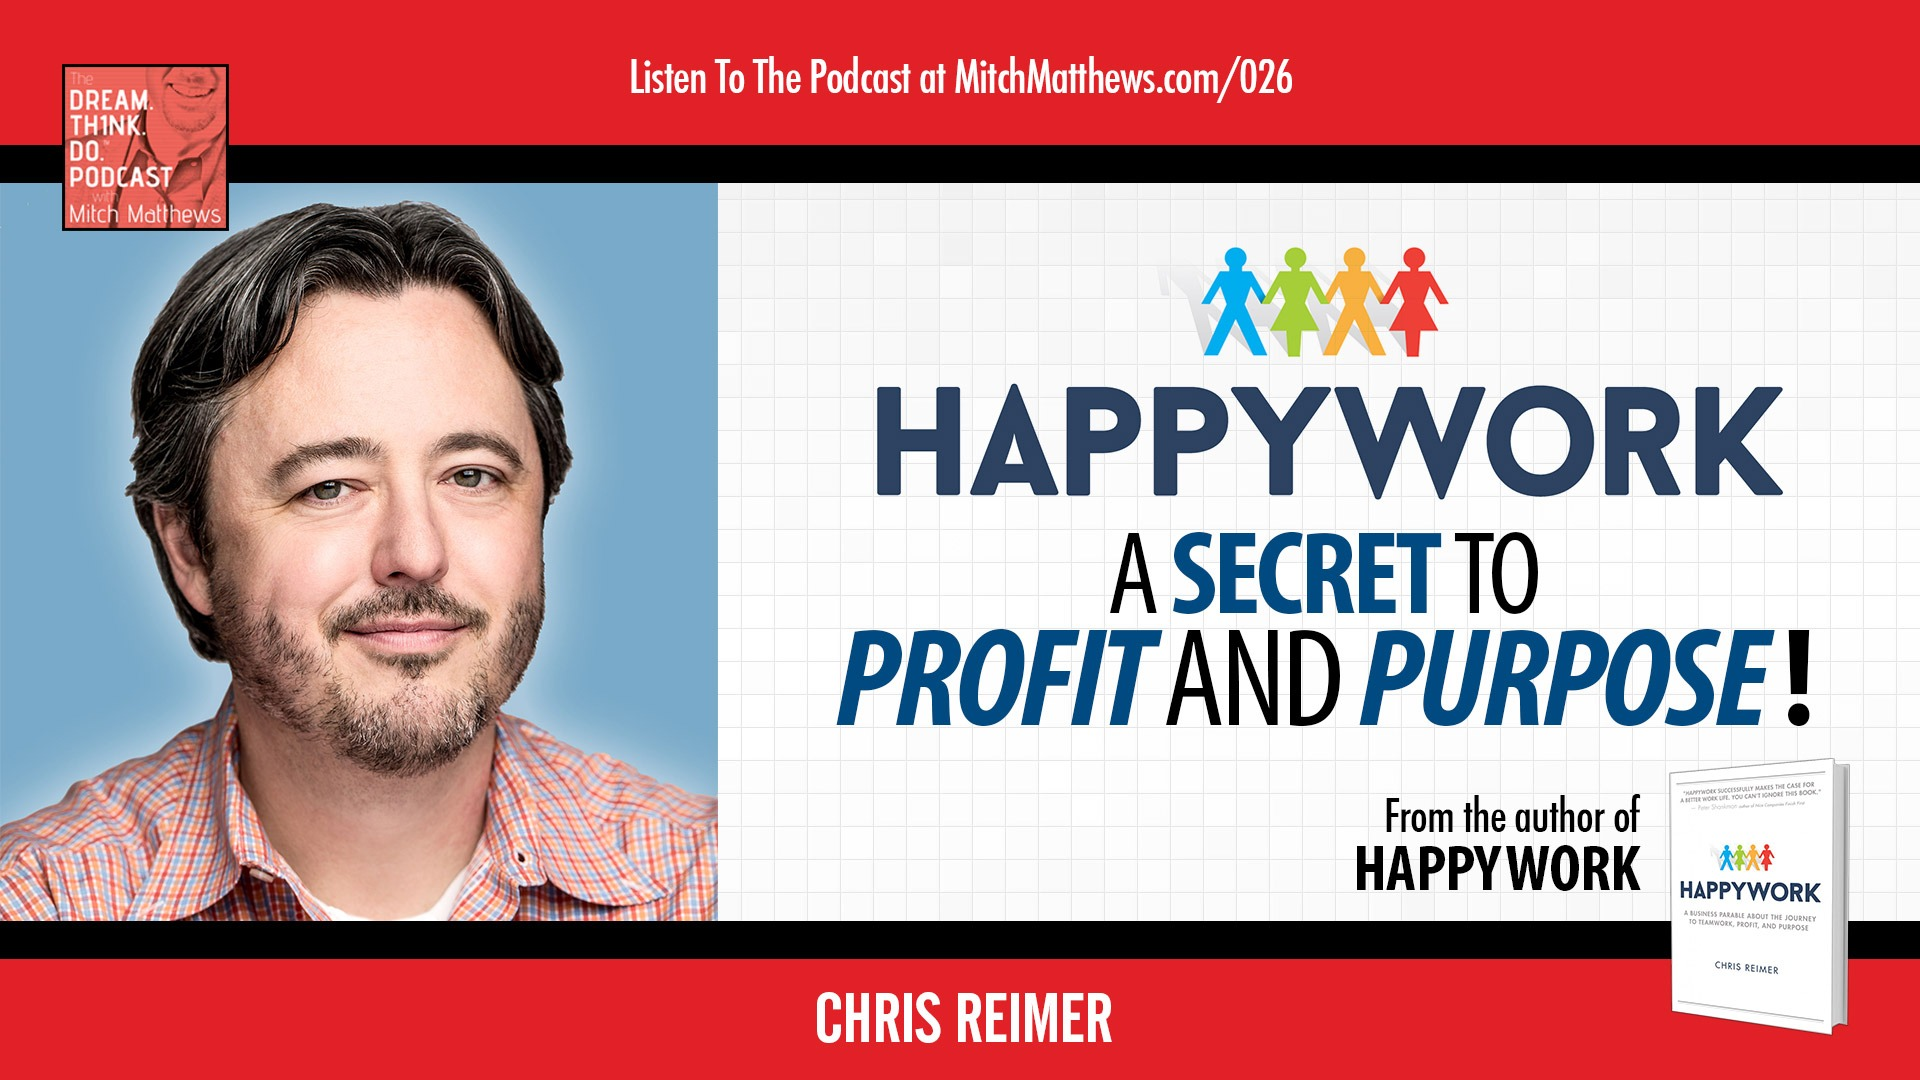 Chris Reimer | Happywork - A Secret to Profit and Purpose!